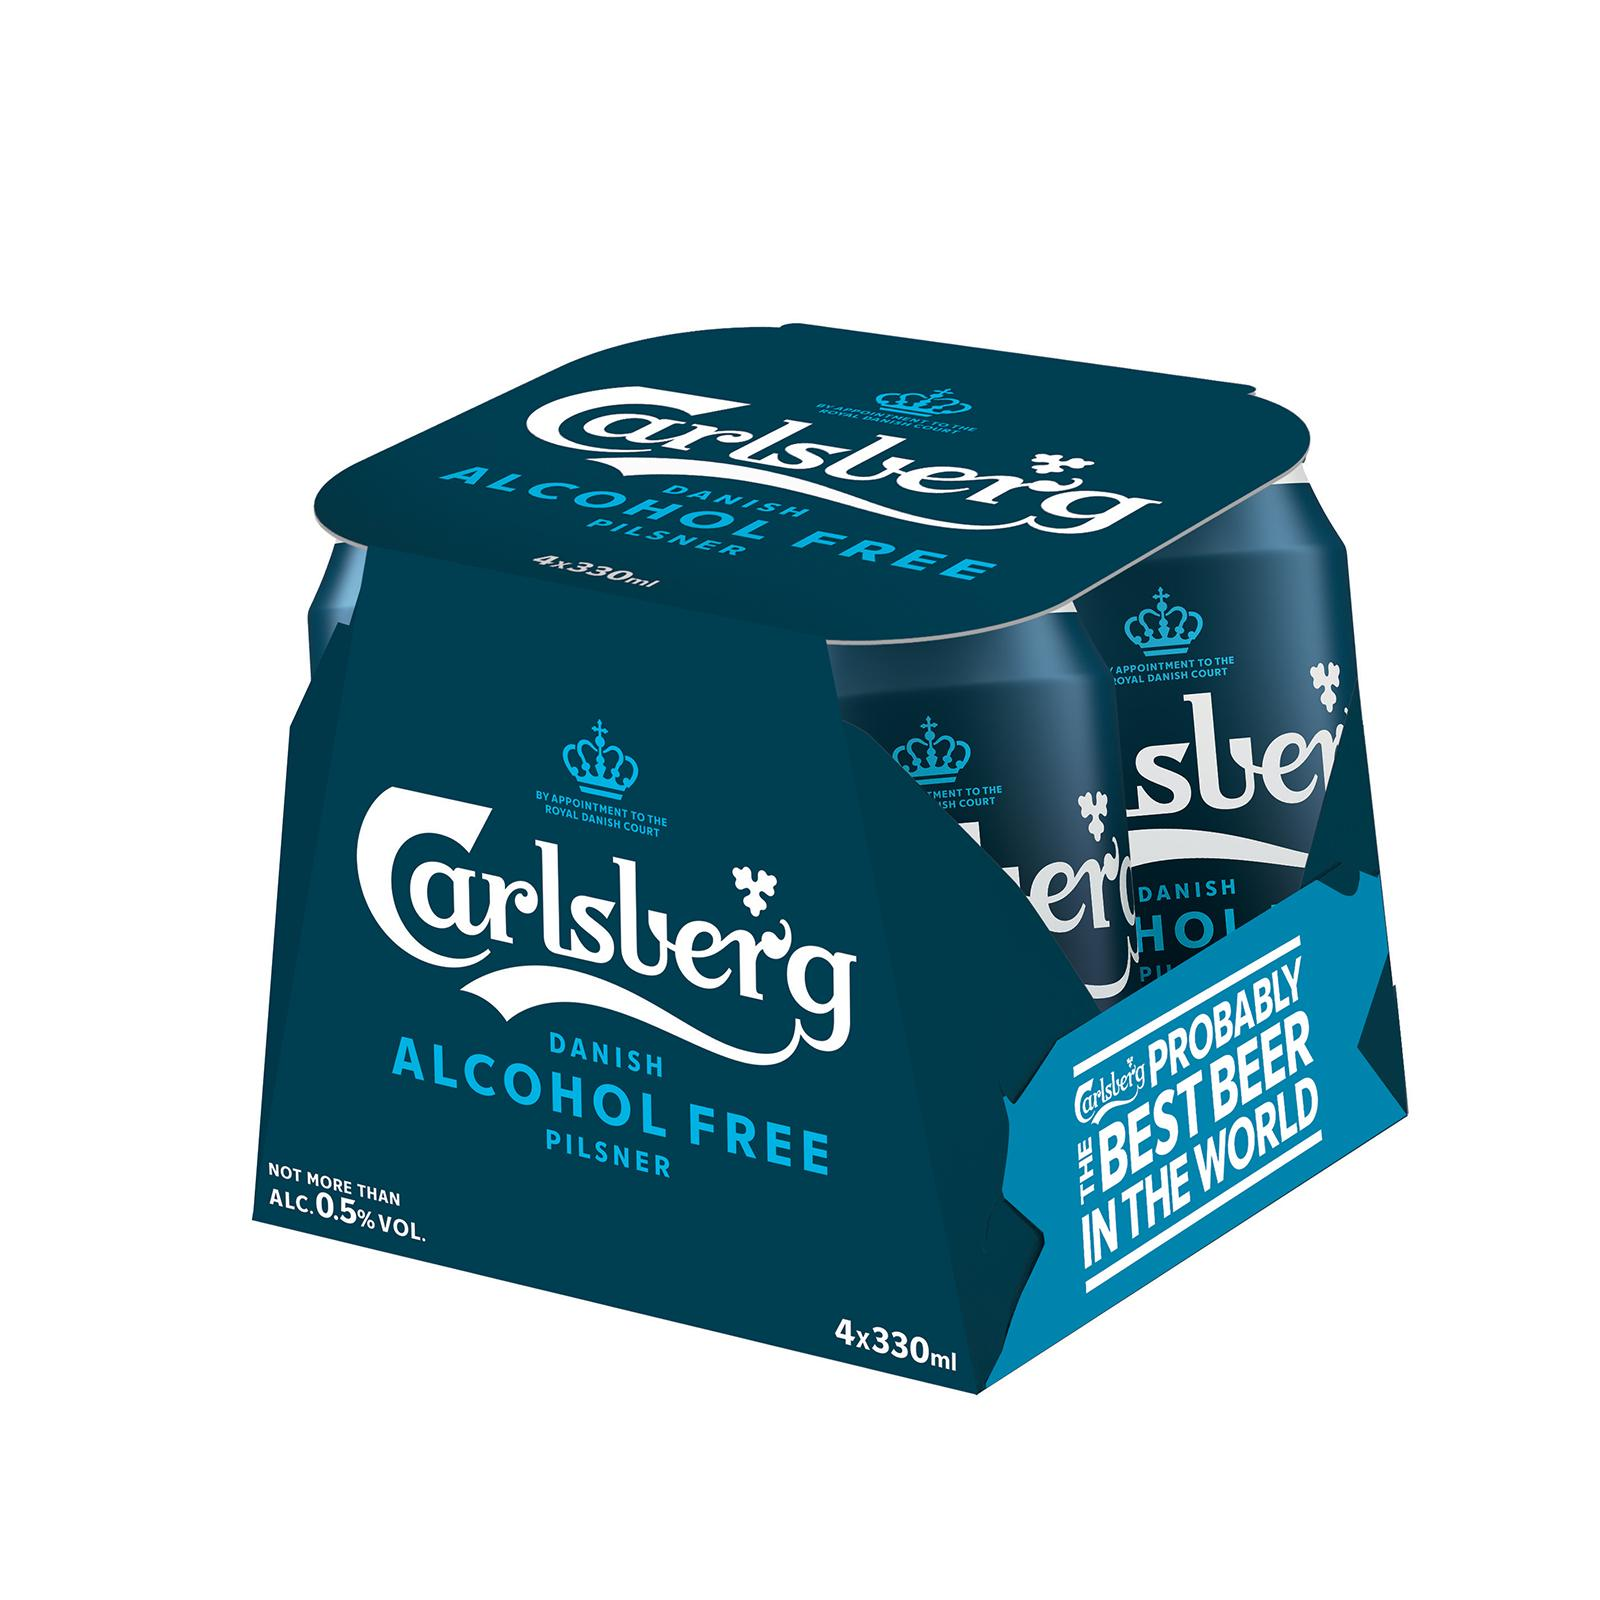 Carlsberg Alcohol-Free Pilsner Beer Can 330ml (Pack of 4)